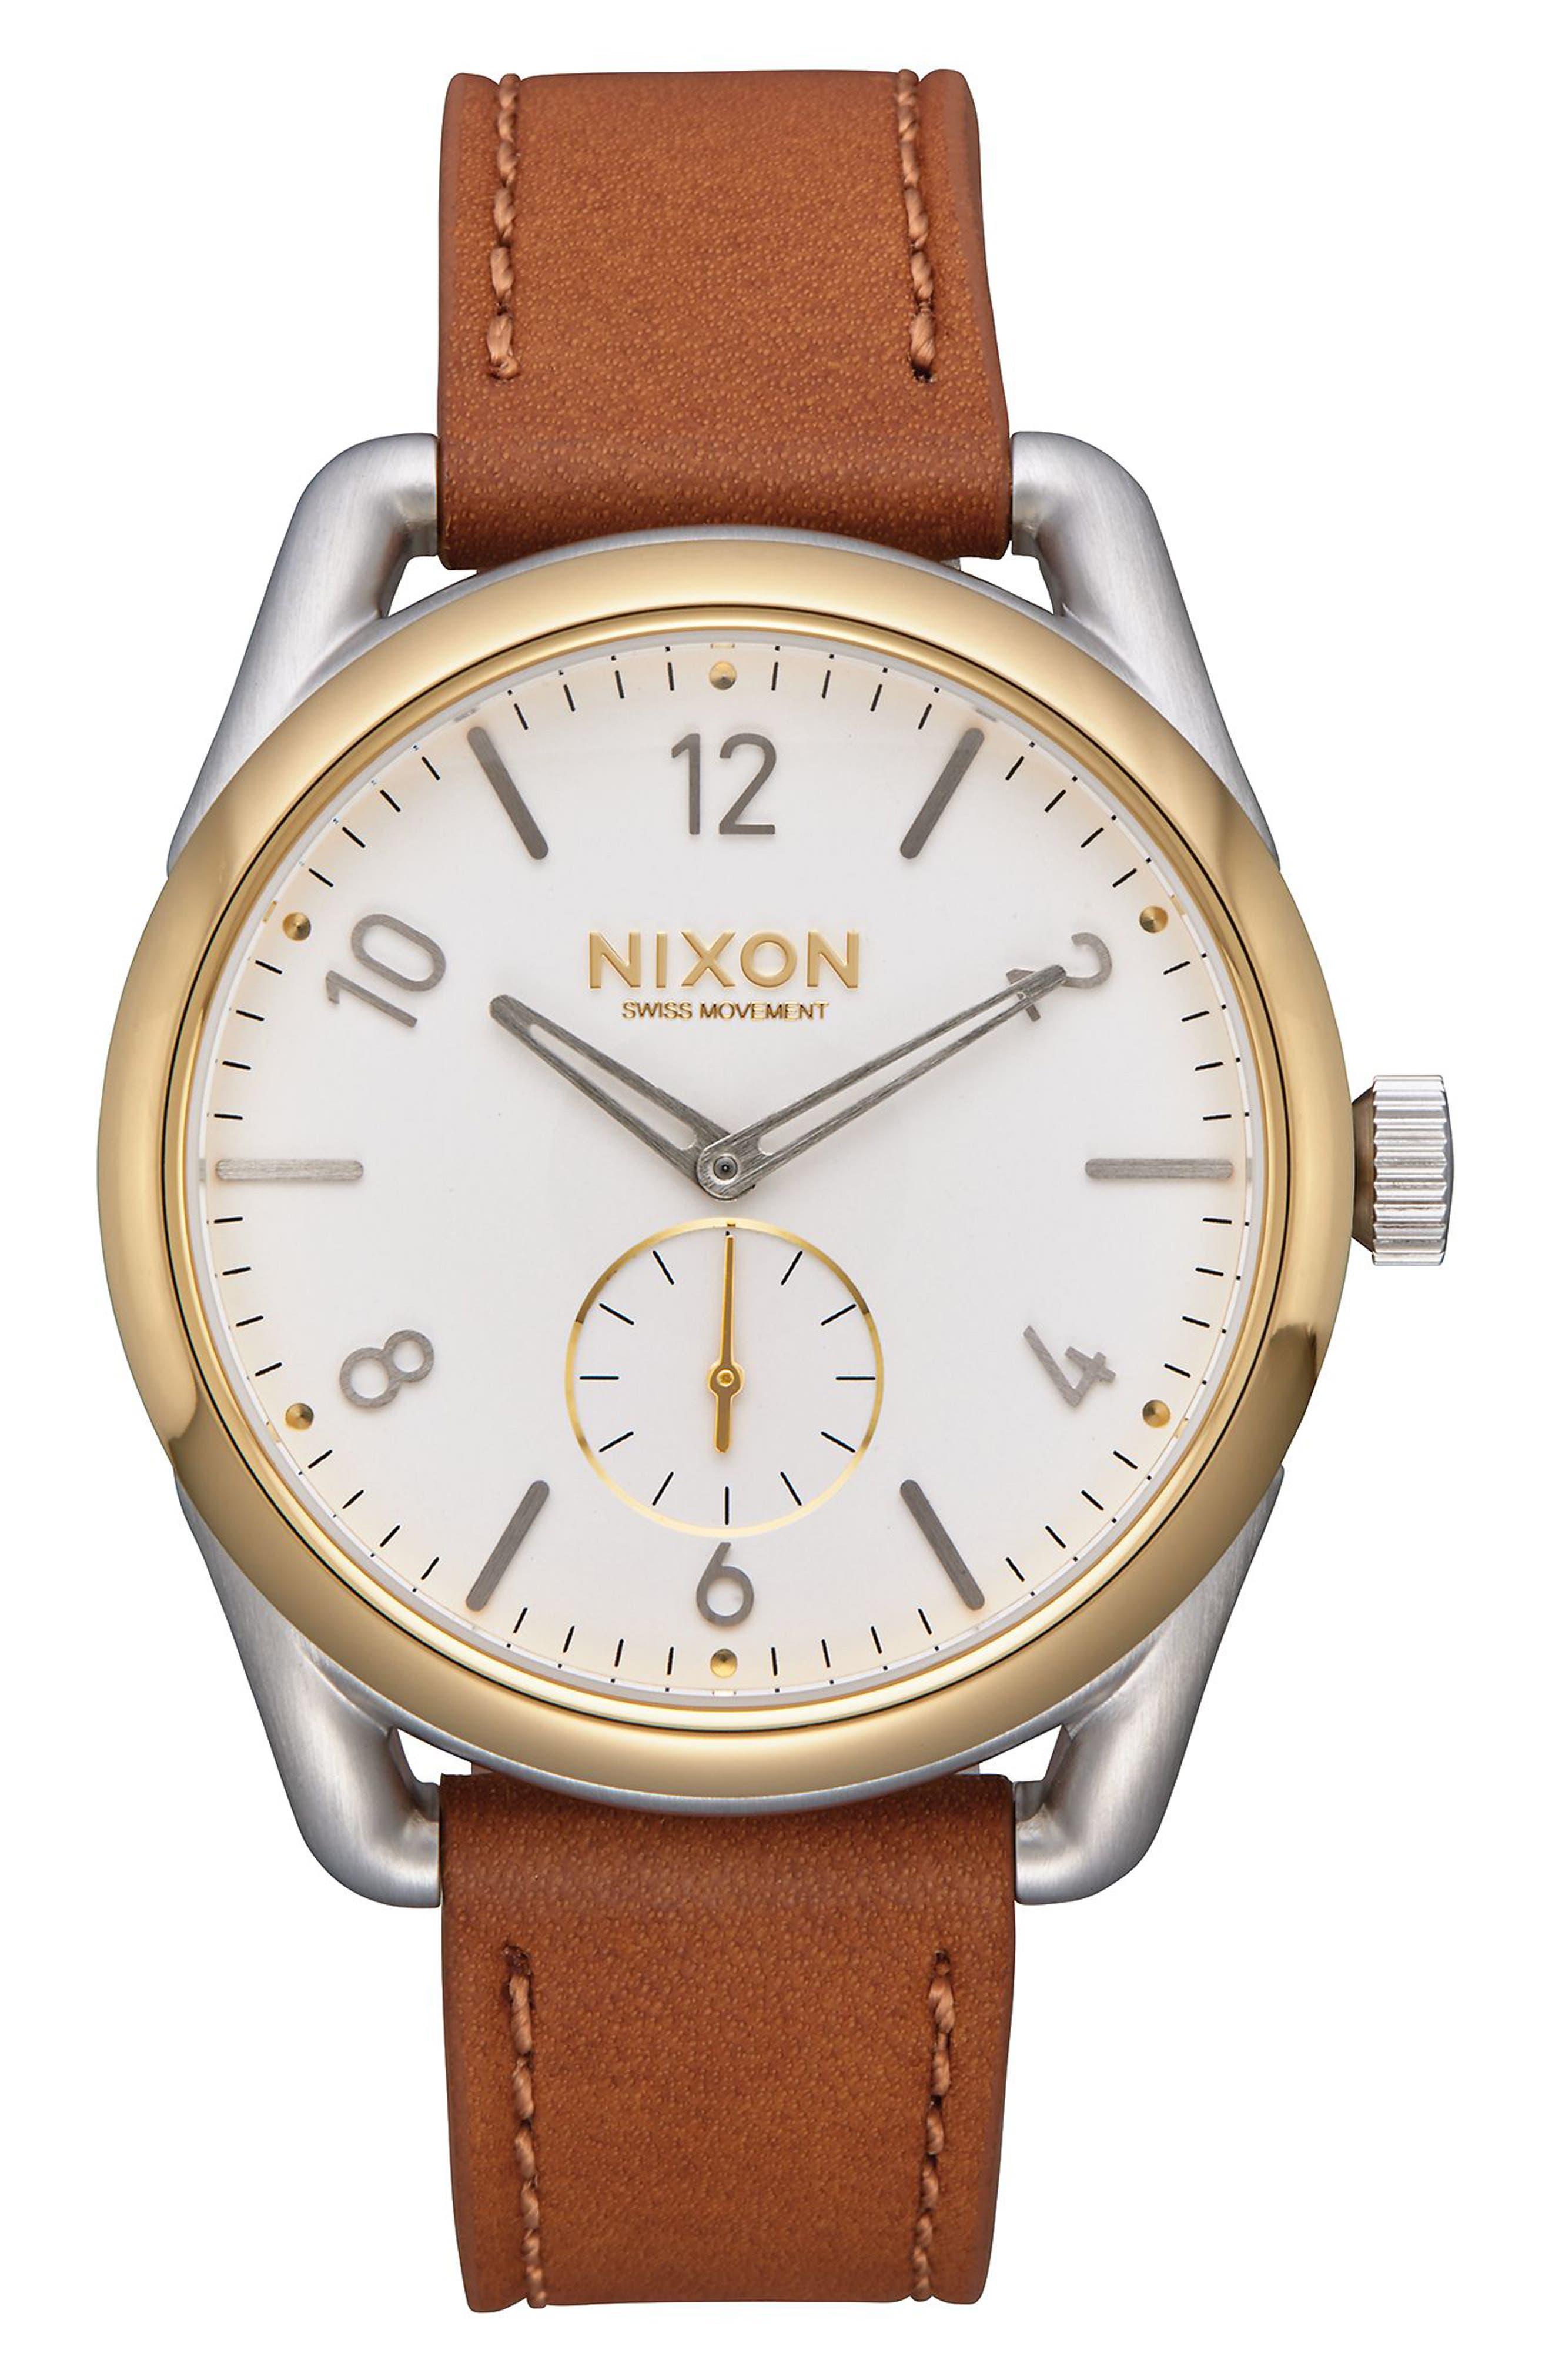 Nixon C39 Leather Strap Watch, 39mm